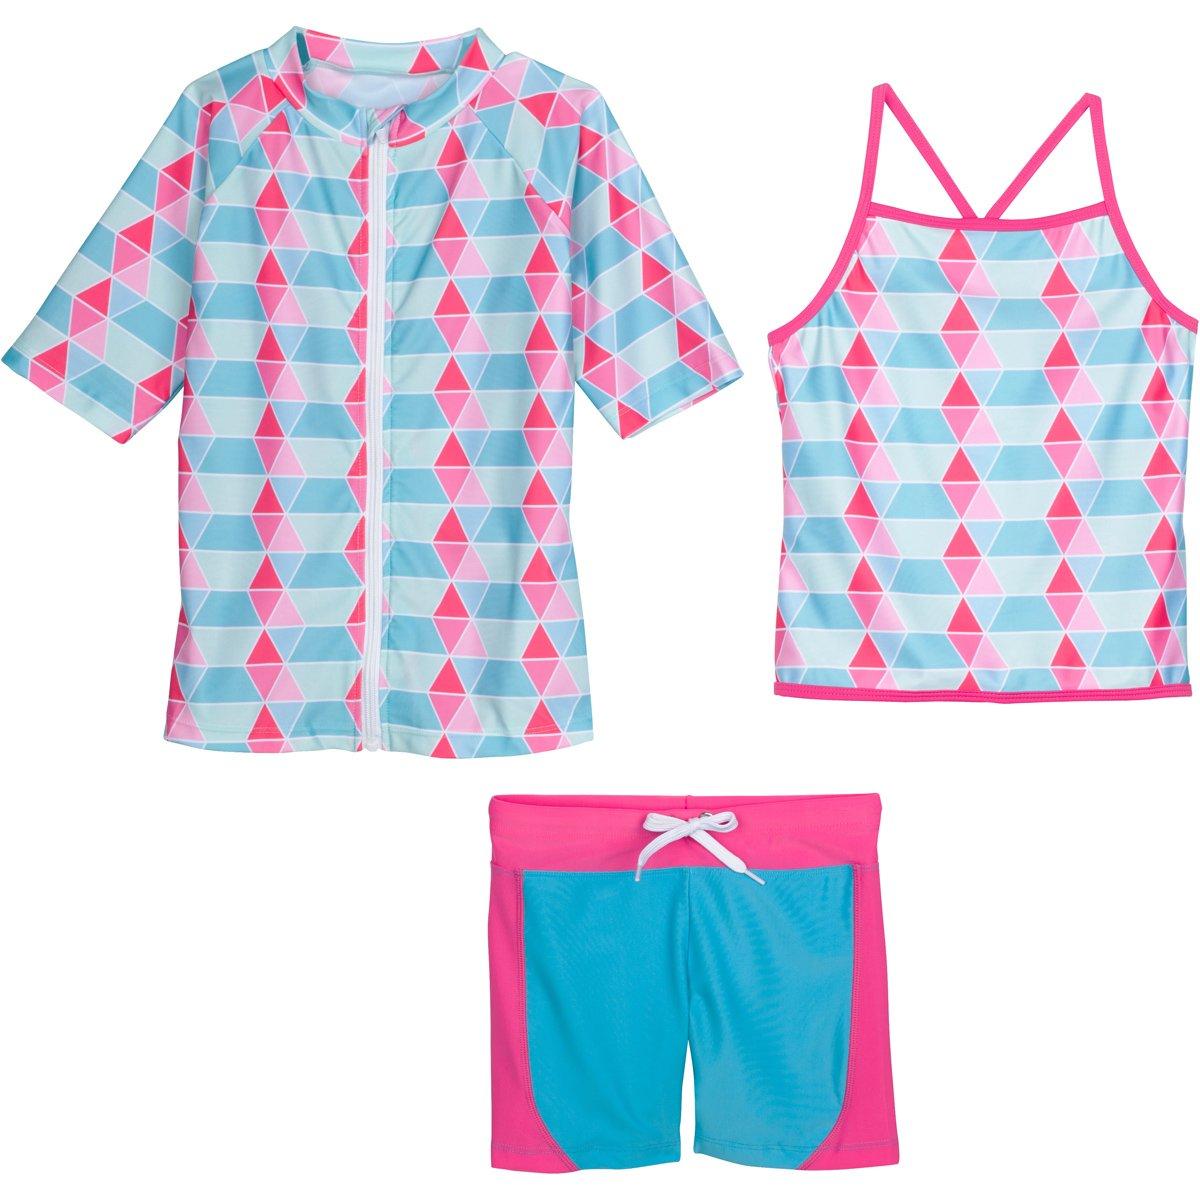 SwimZip Girls Short Sleeve Rash Guard Swim Shorts Set UPF 50+ Sun Protective Zipper Blue 4T SZISSSHORTSET3PC16